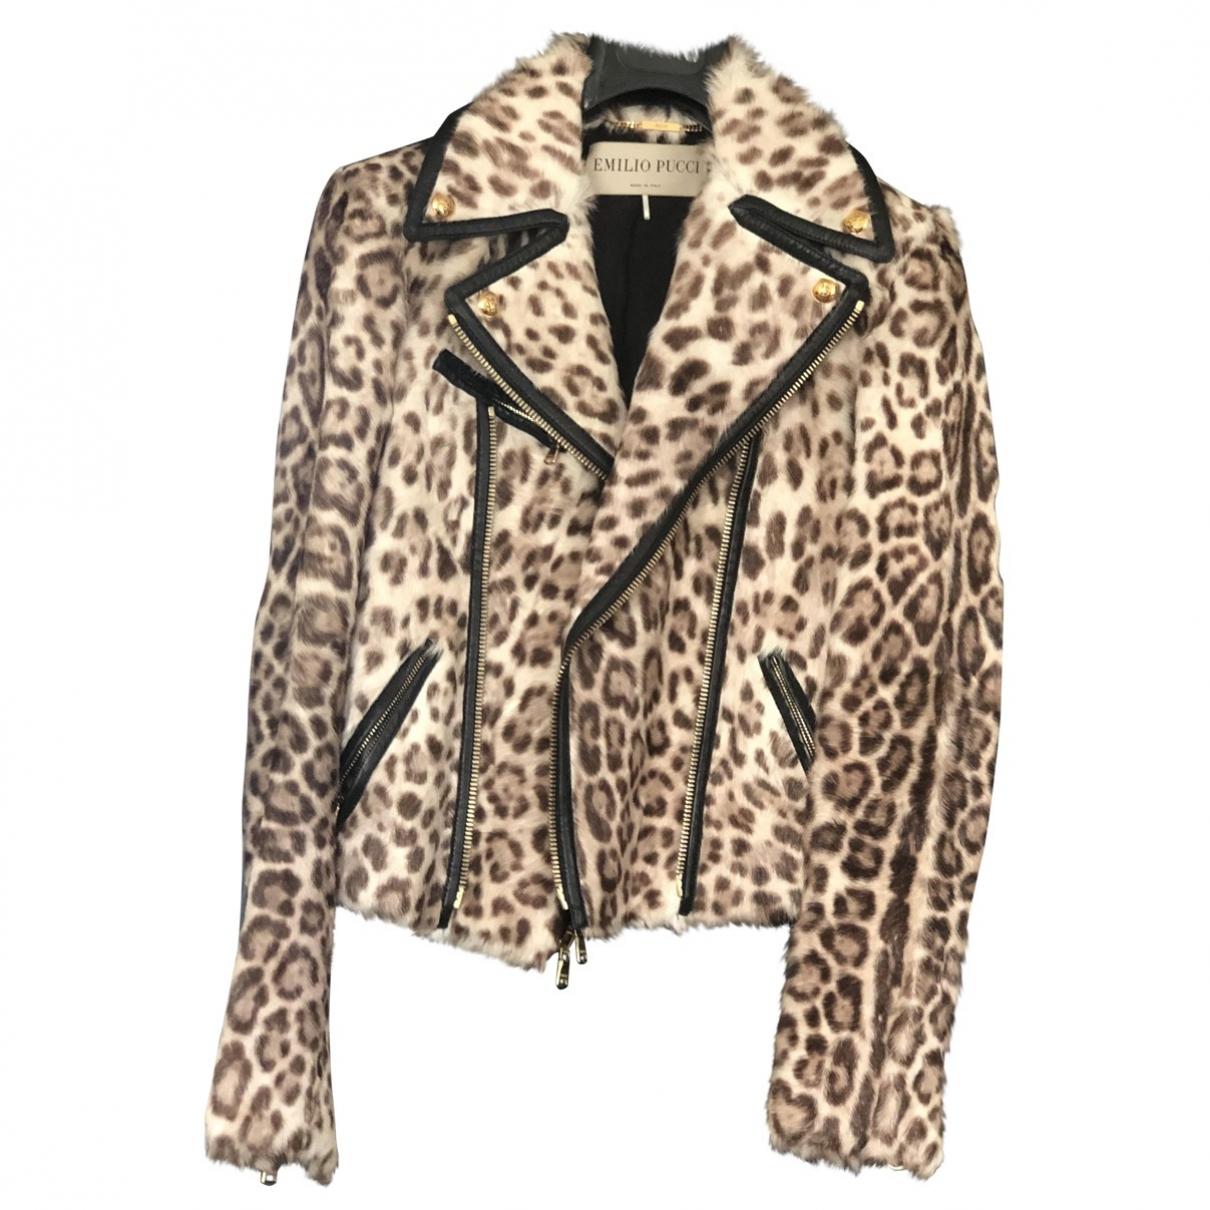 Emilio Pucci \N Brown Fur jacket for Women 40 IT